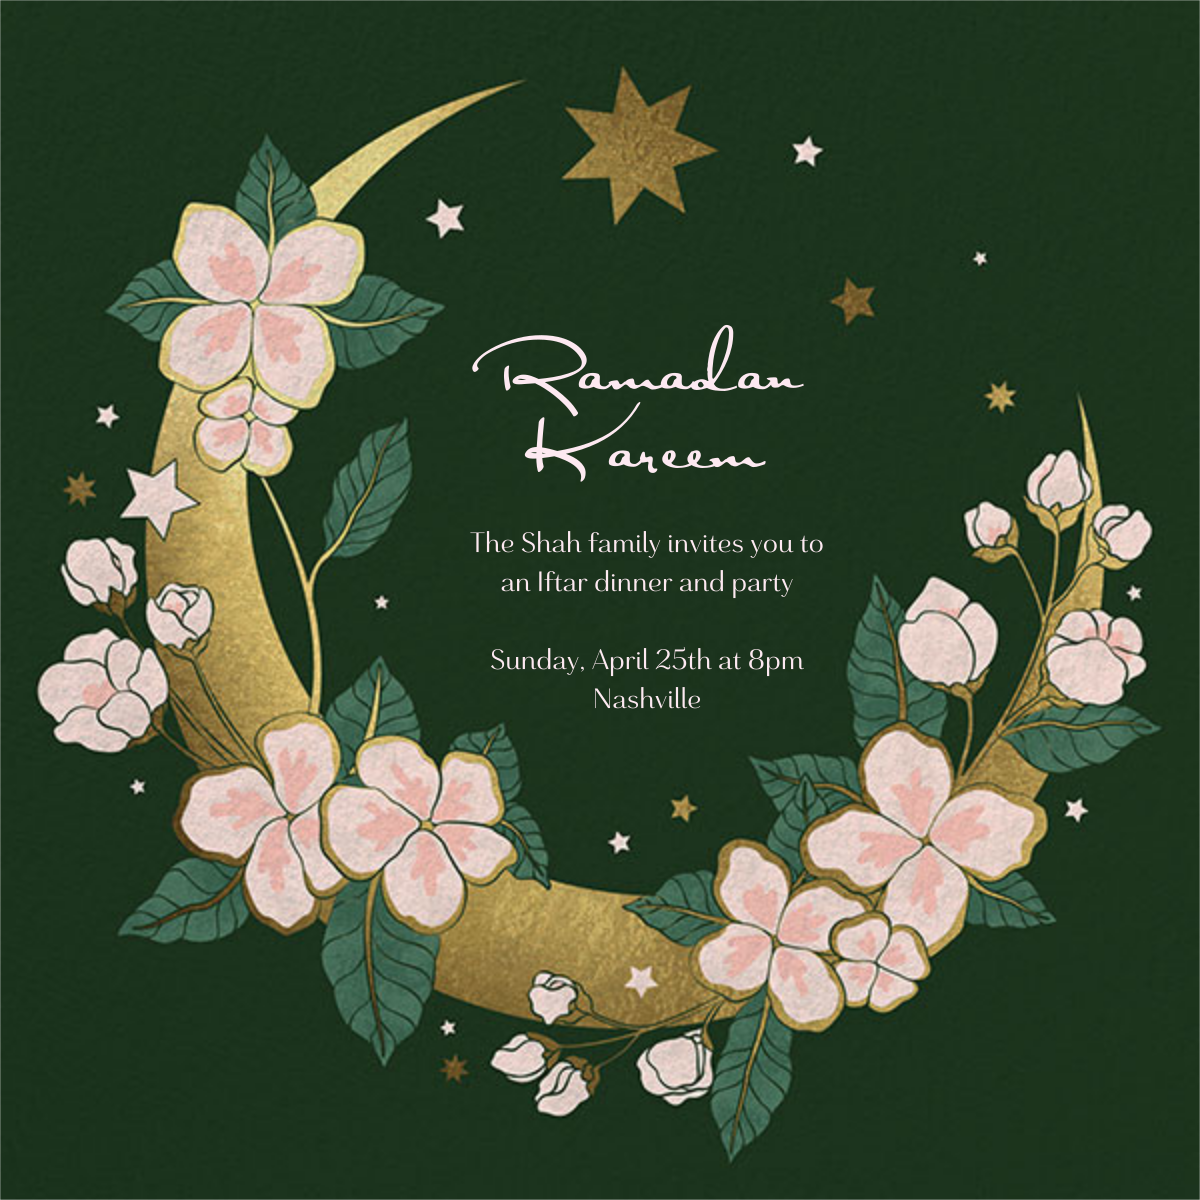 Moon in Bloom - Paperless Post - Ramadan